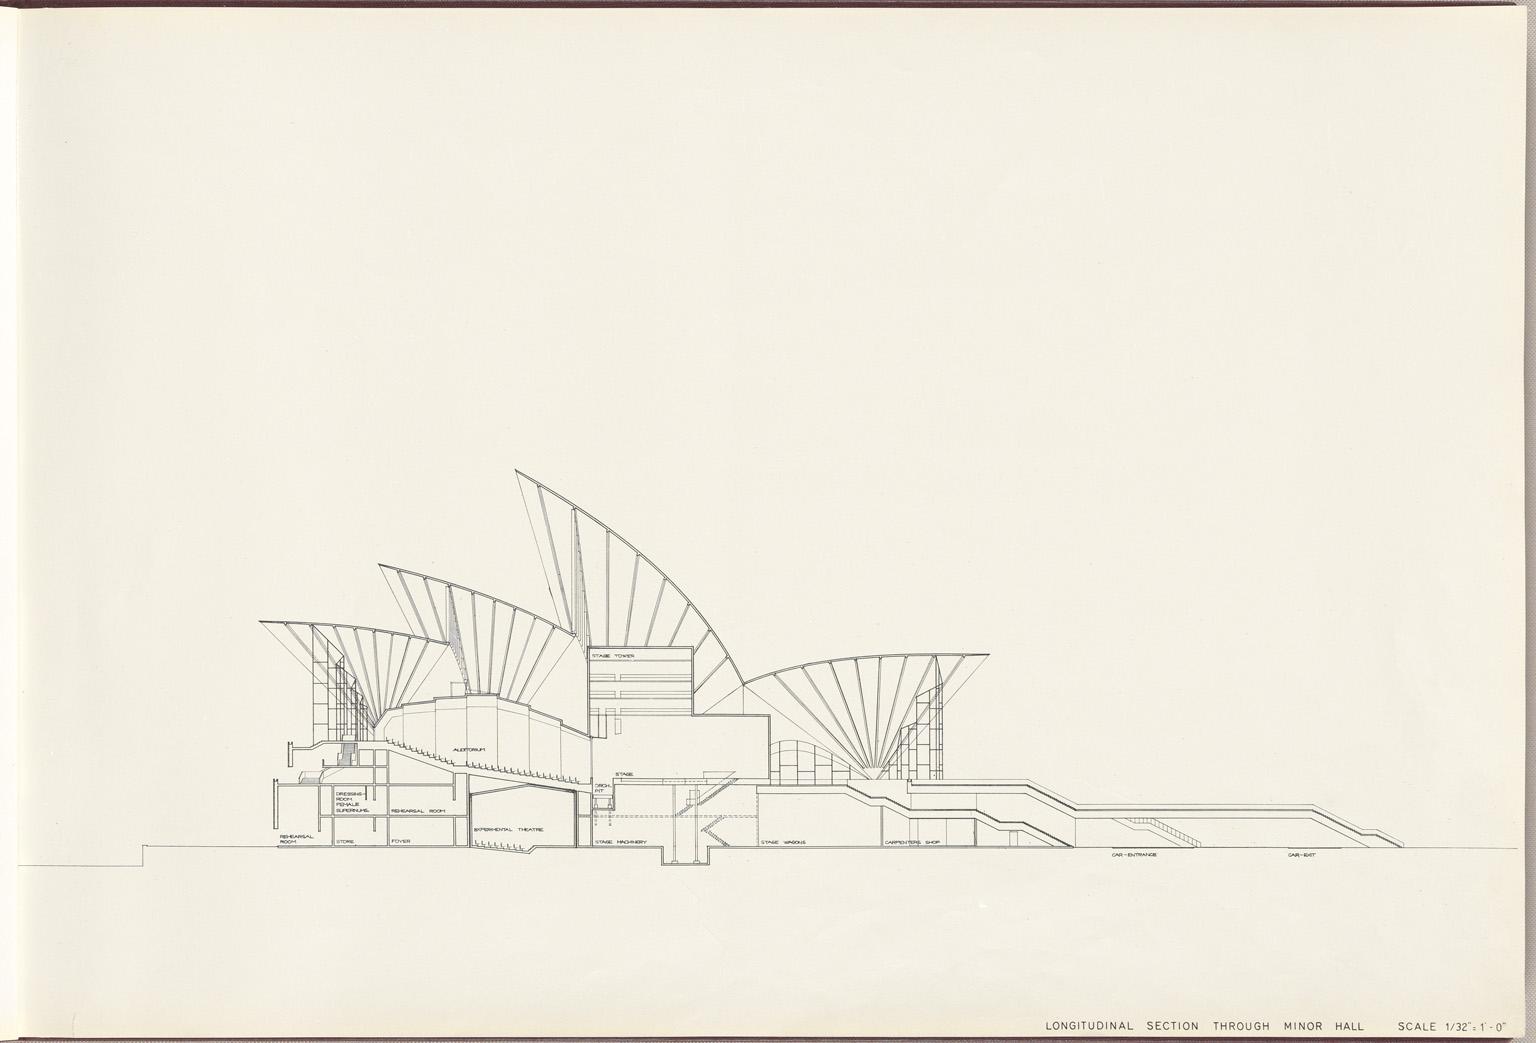 Longitudinal section through minor hall Sydney Opera House Red Book